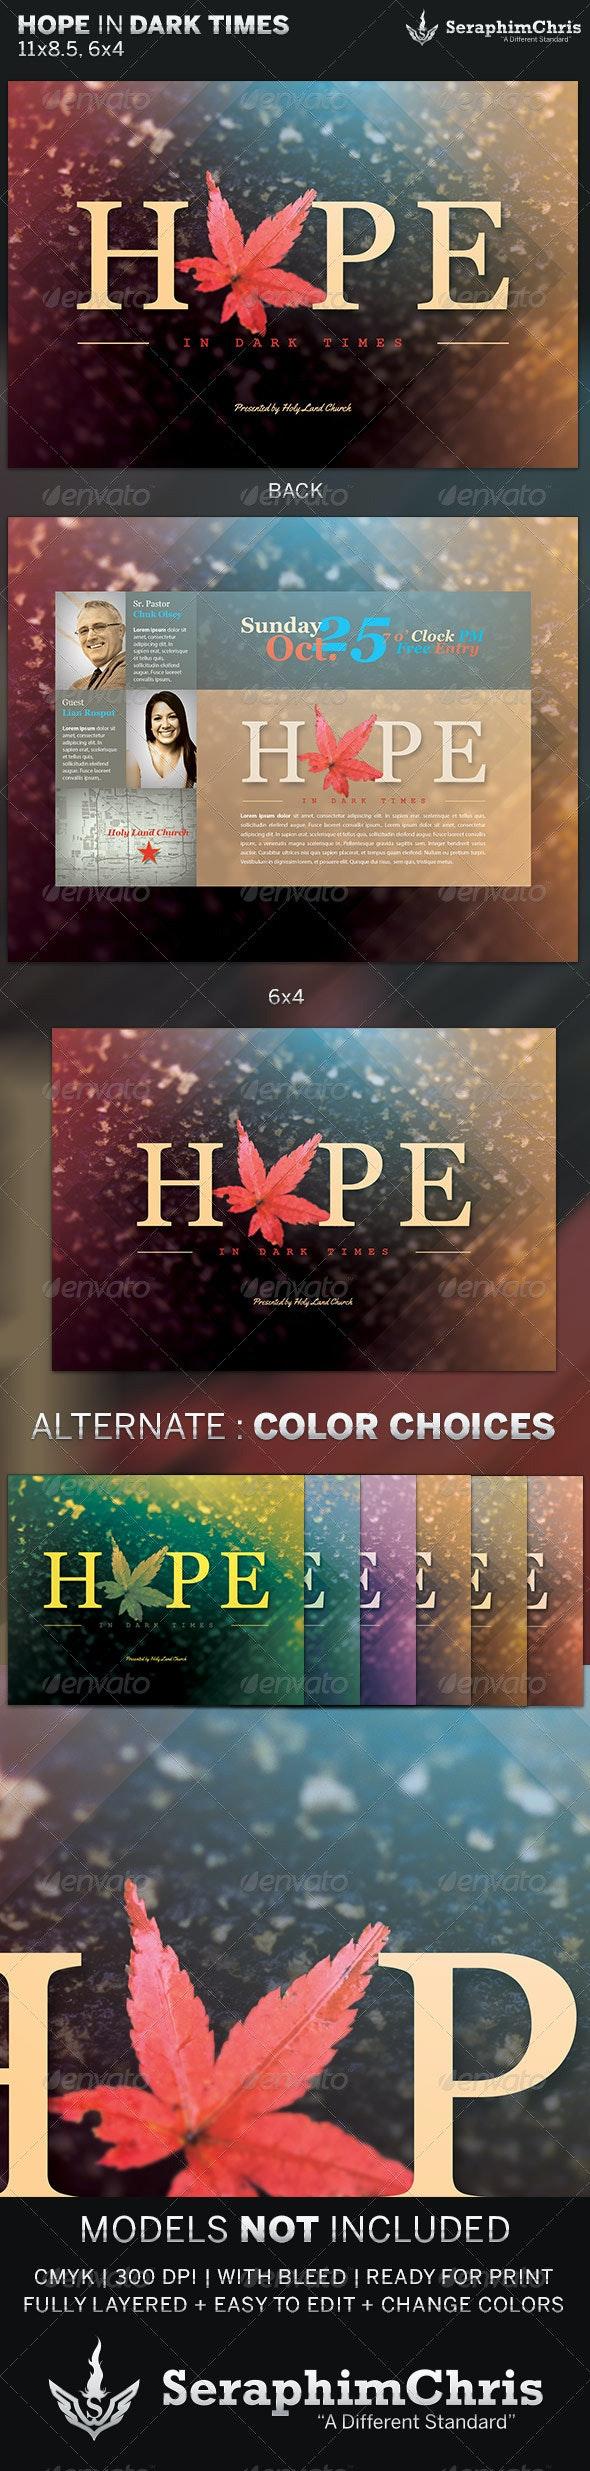 Hope in Dark Times: Church Flyer Template - Church Flyers